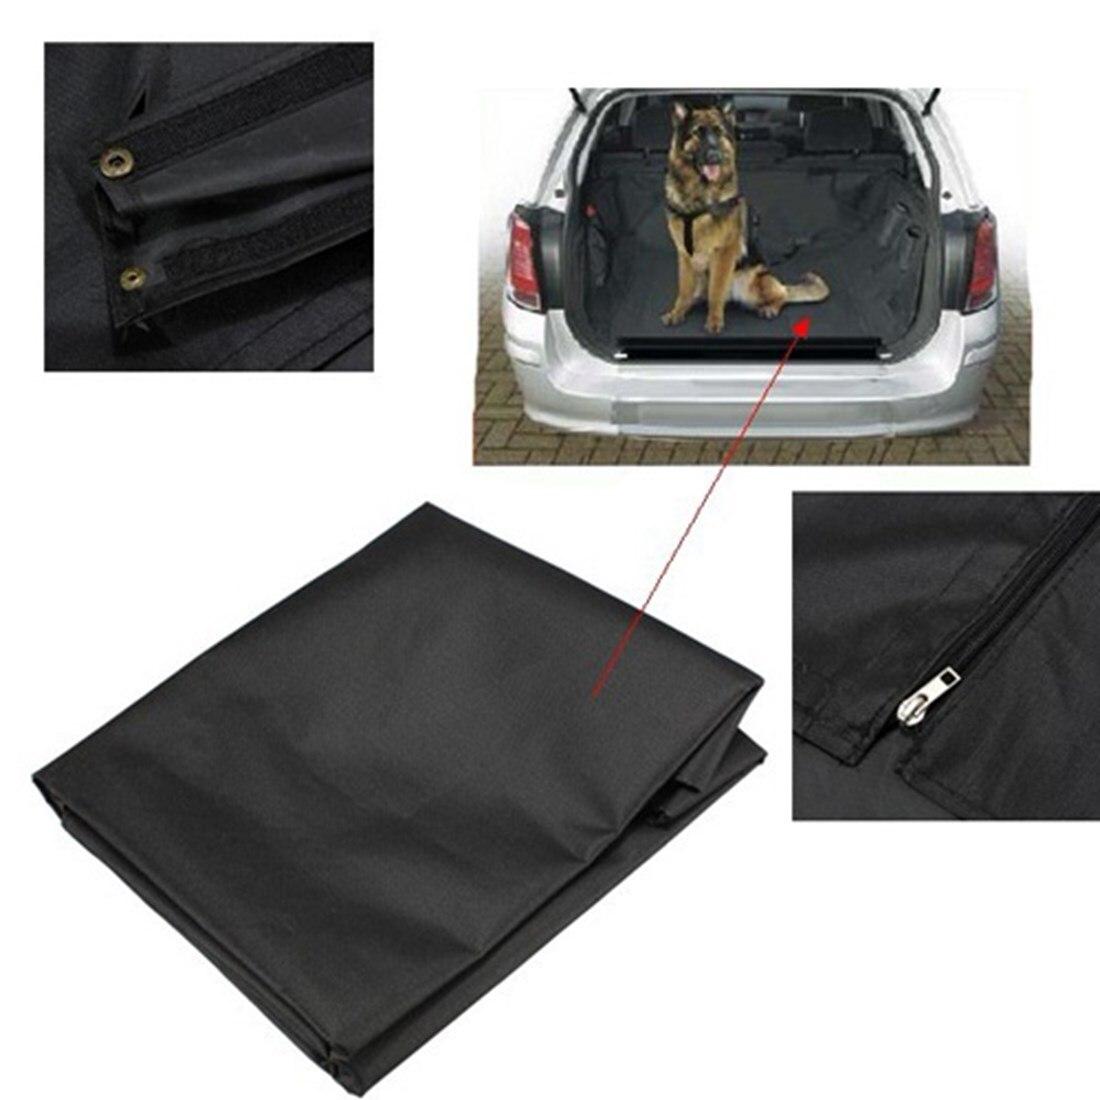 Rubber floor mats singapore - Black Universal Waterproof Car Boot Protector Liner Dog Pet Floor Mat Cover Seat Large Size